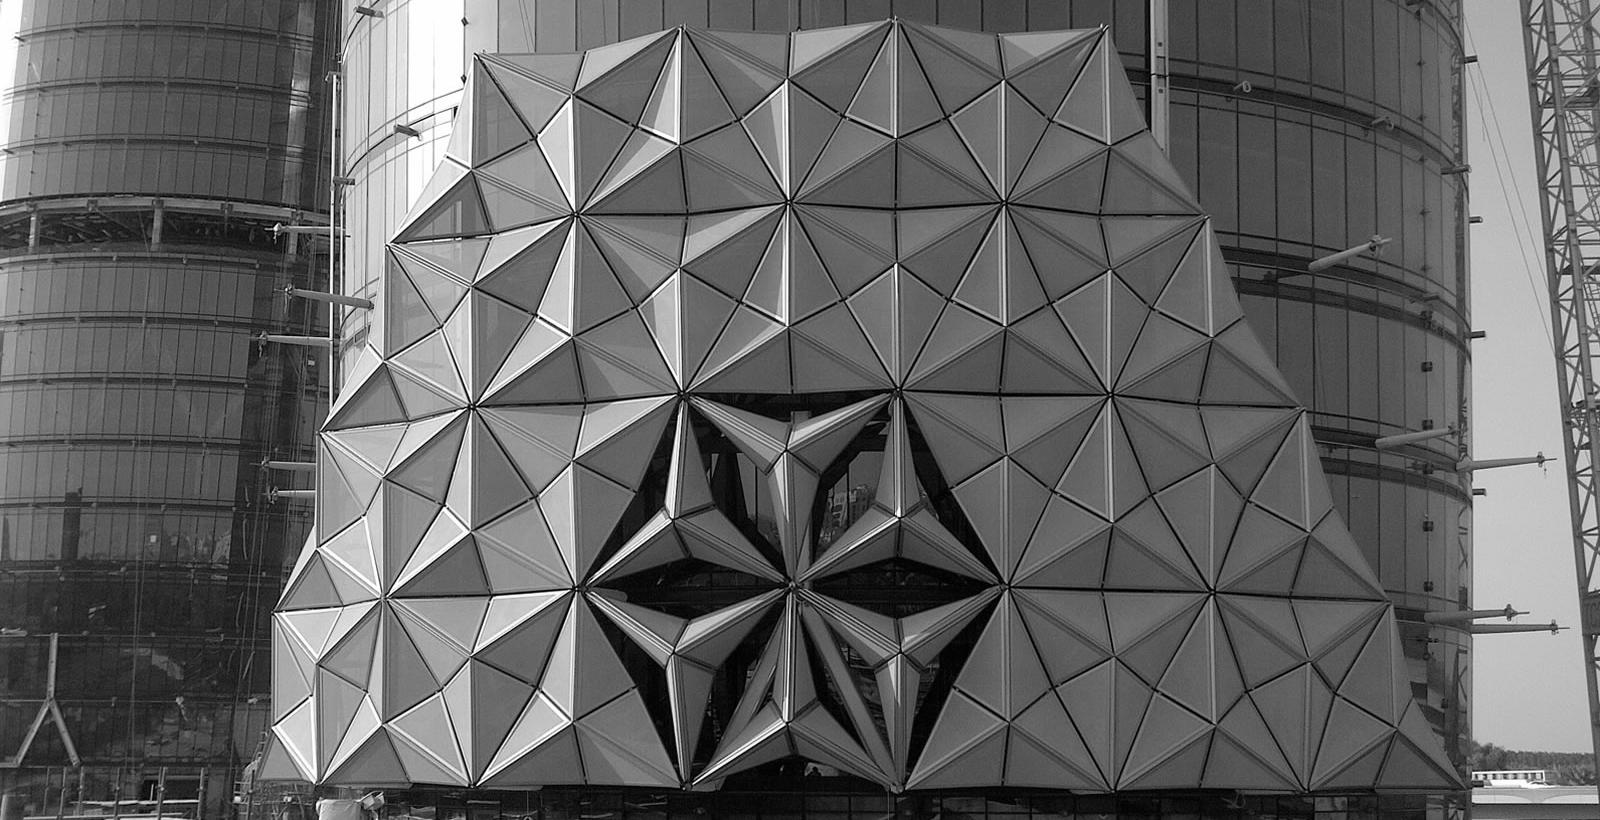 Salon202 Aedas Fabricates Kinetic Facade In Abu Dhabi